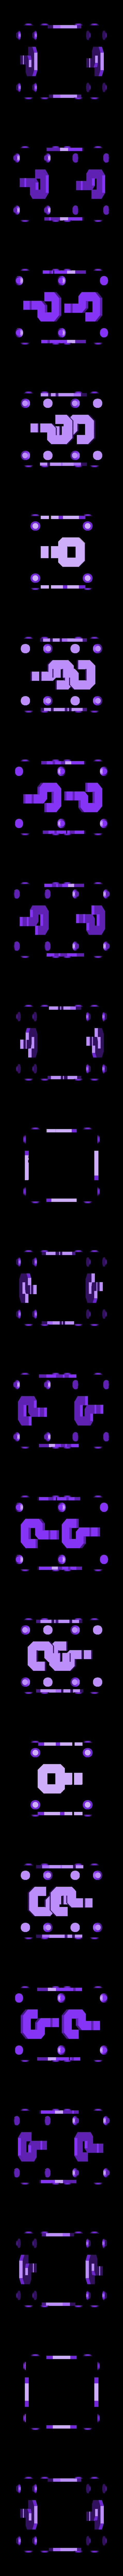 qblock-marks.stl Download free STL file Dual Extrusion Question Block • 3D print template, Adafruit